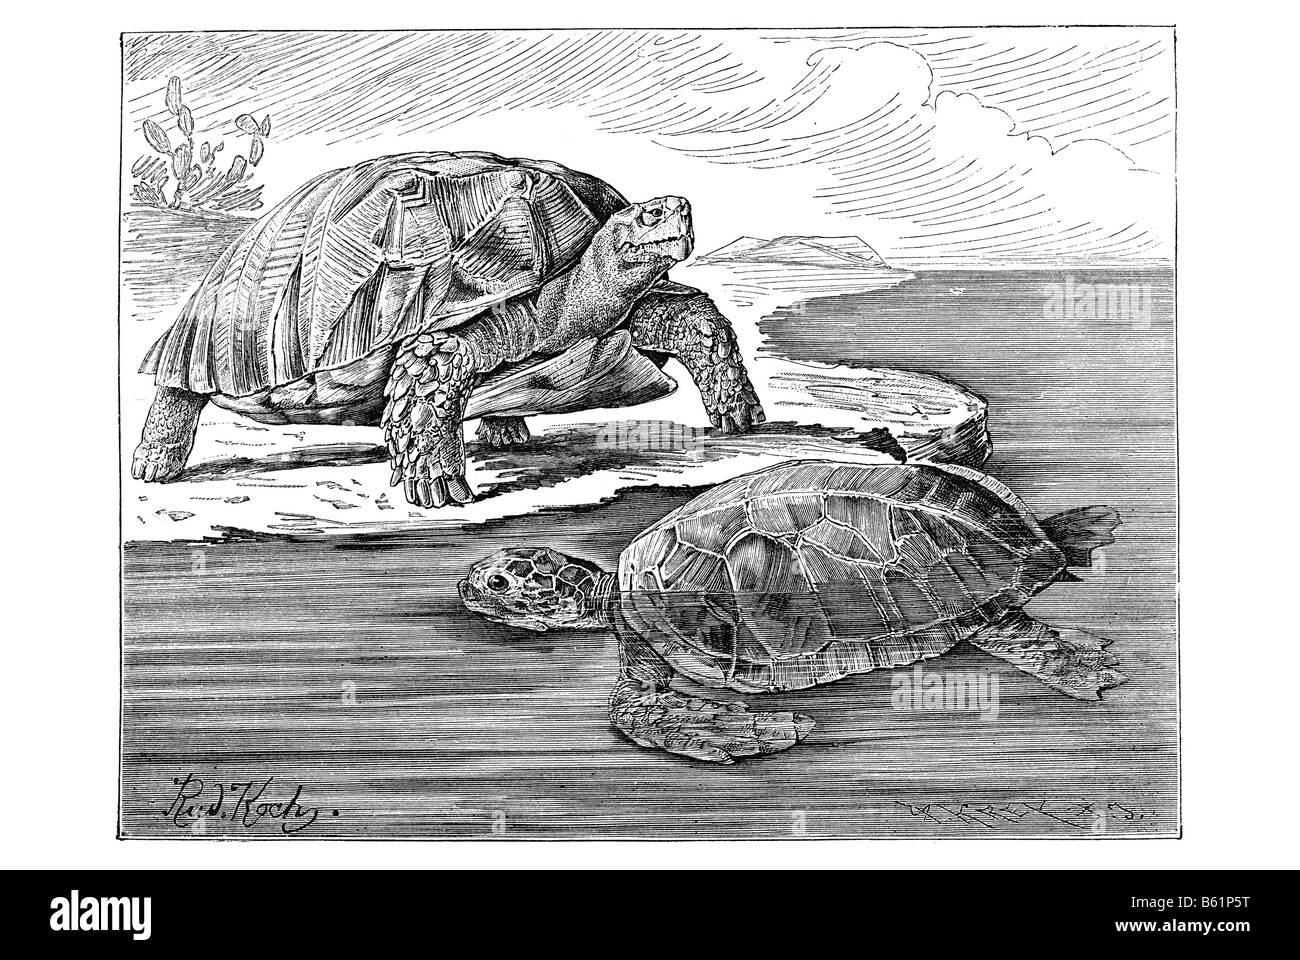 turtles, Tortoises or land turtles Stock Photo